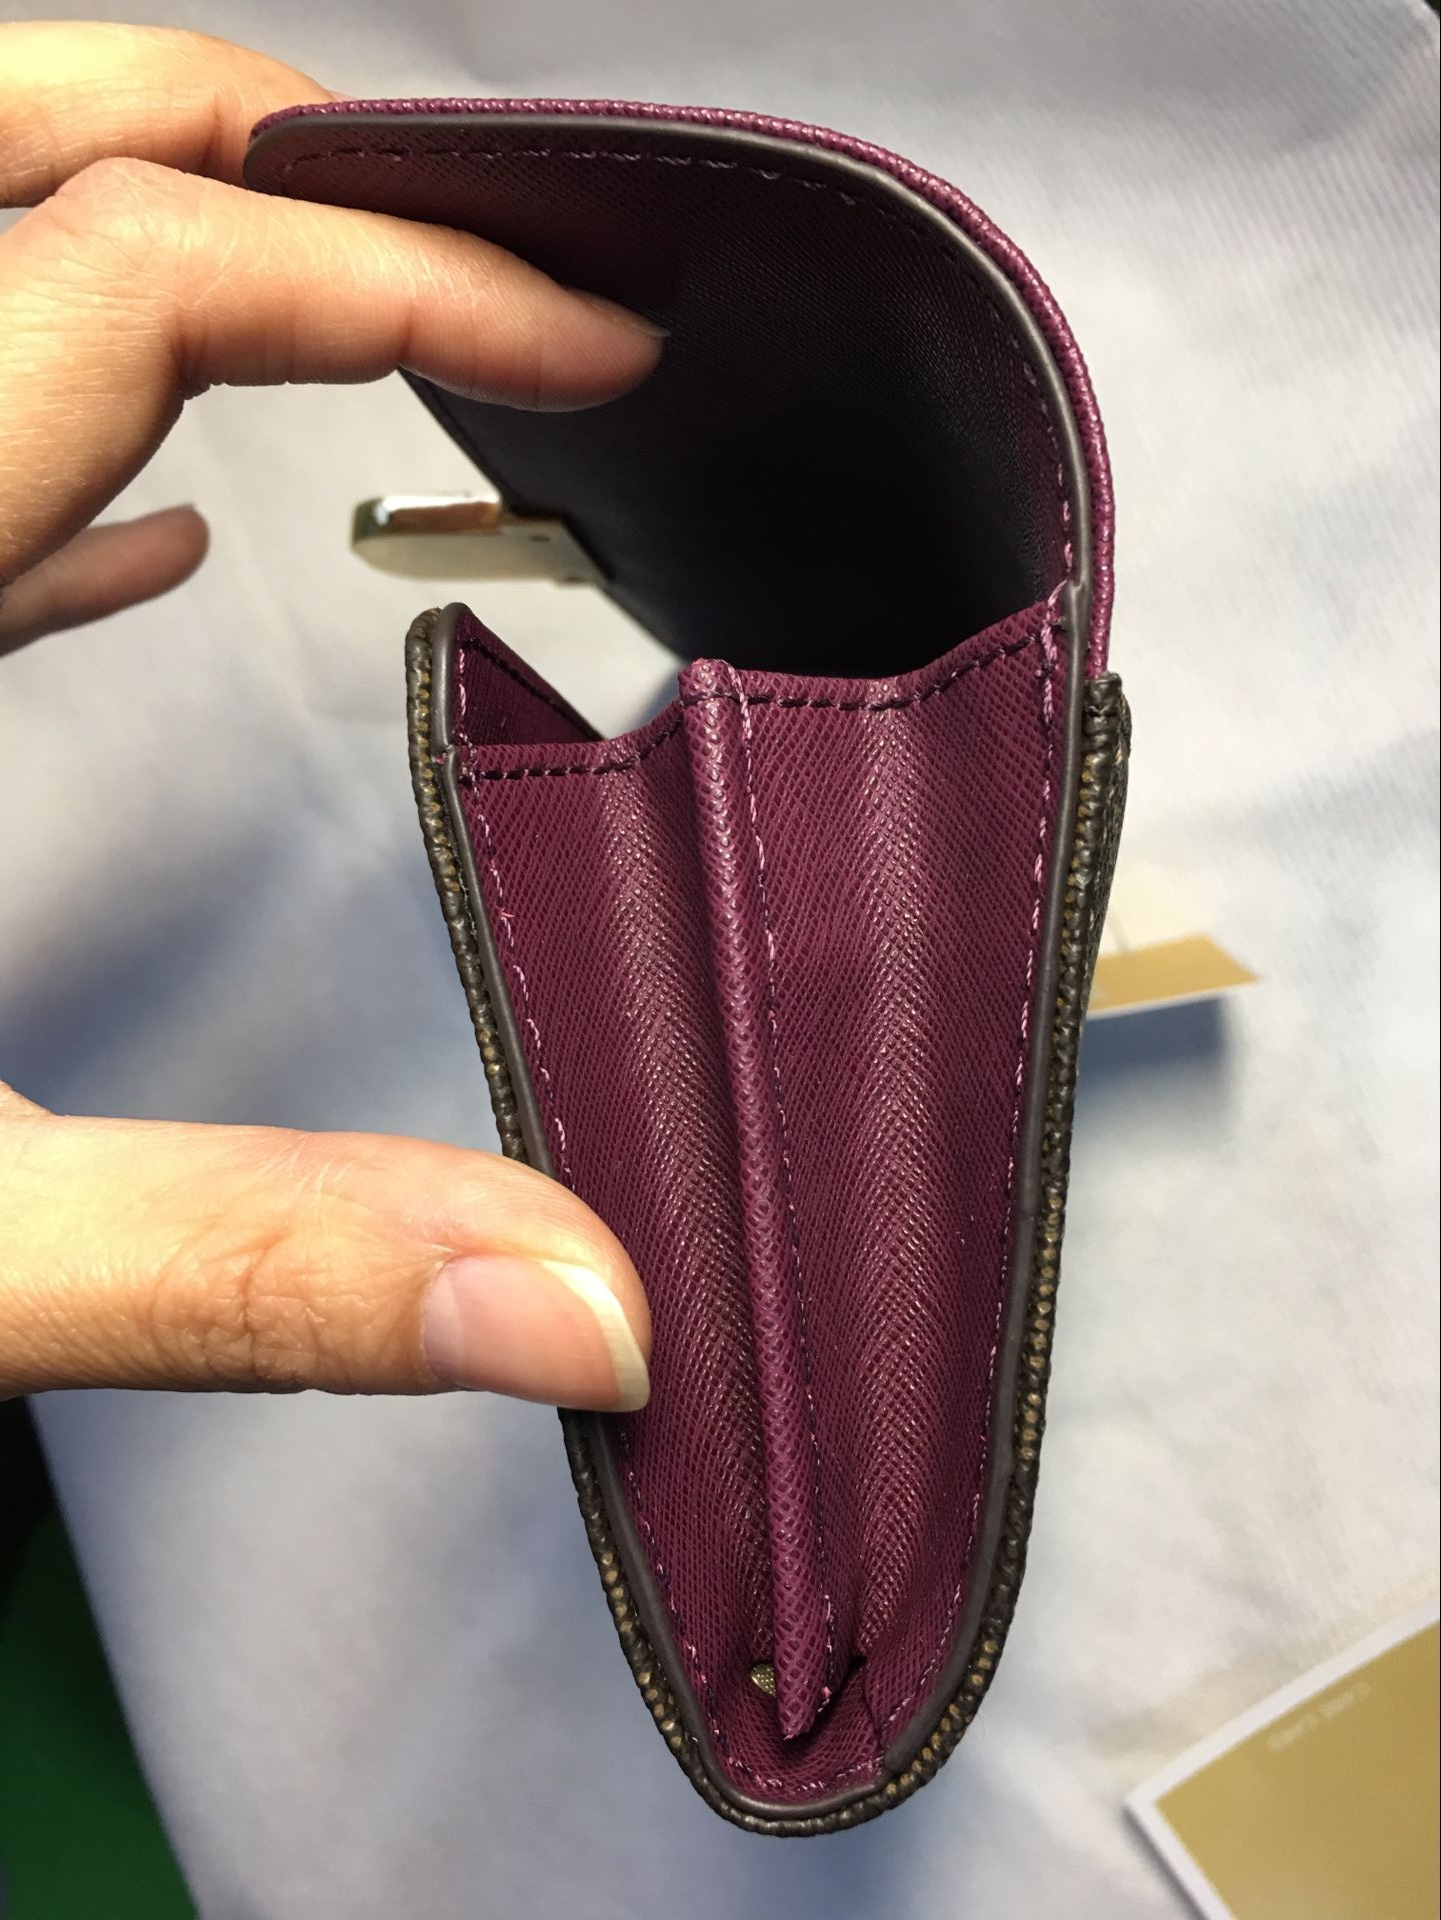 12f4bb5505f953 Authentic Michael Kors Signature PVC and Leather Bridgette Flap ...